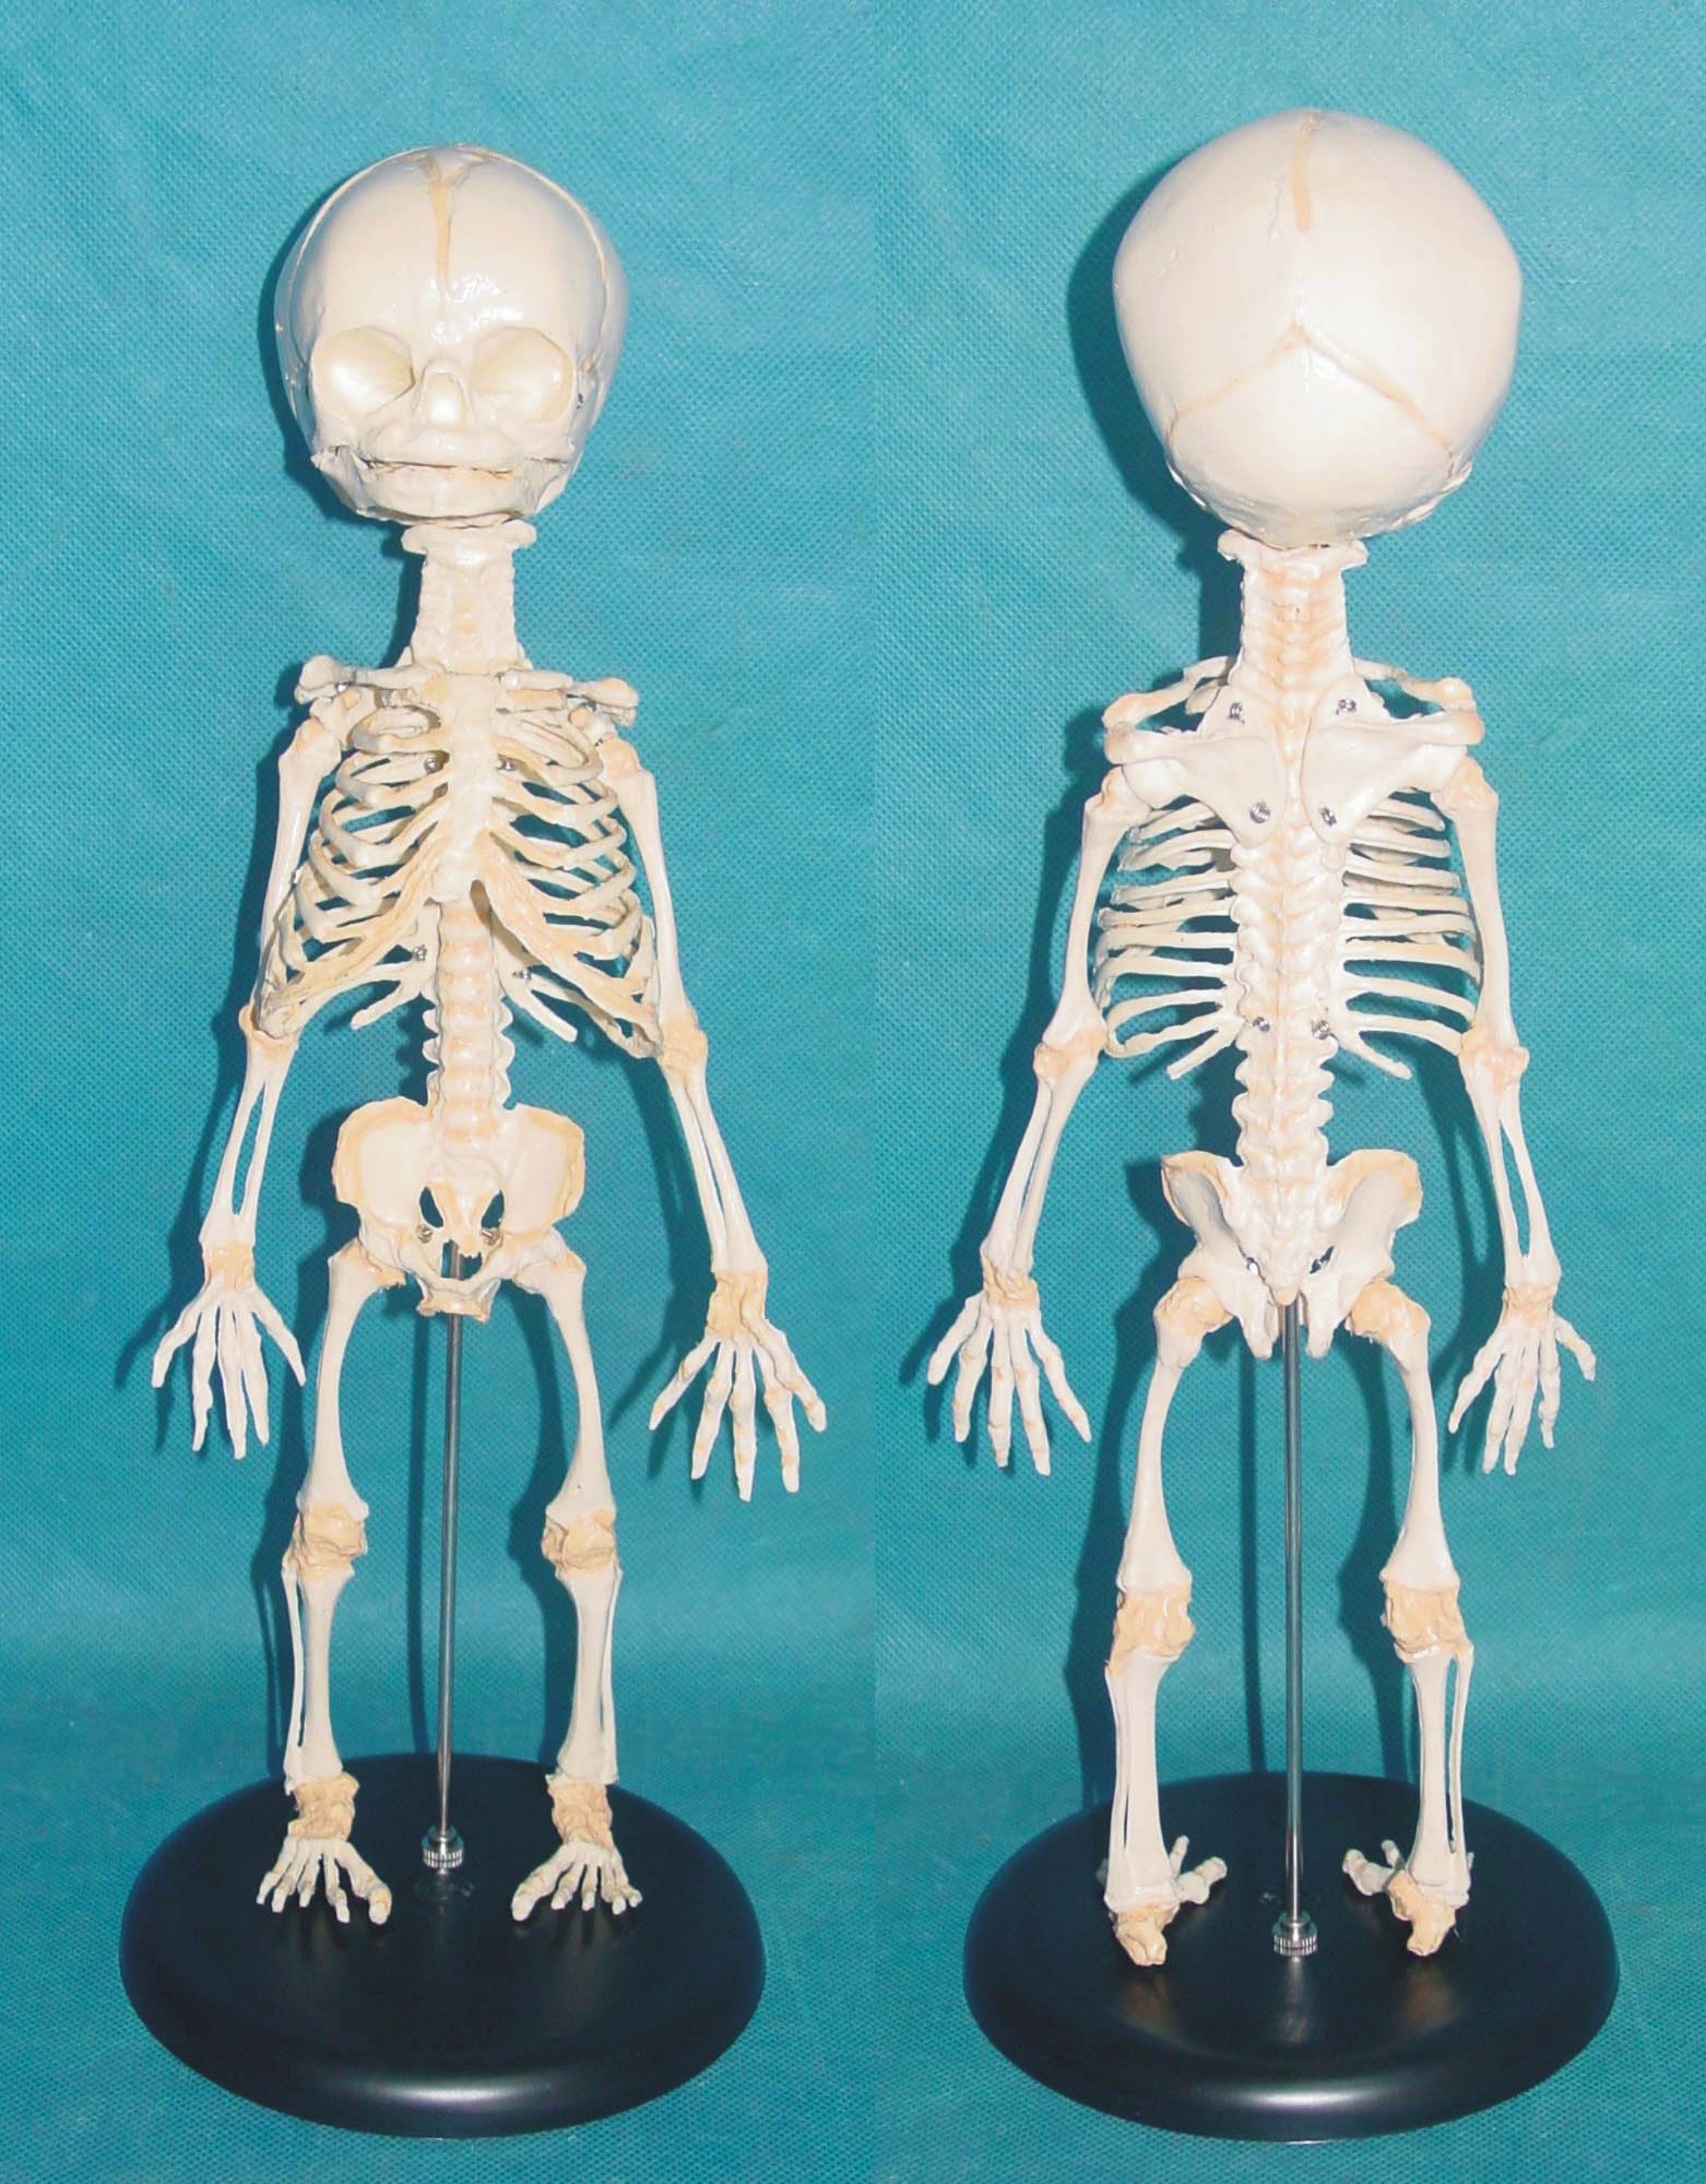 Born, Head, Skull, Baby, Brain, Anatomical